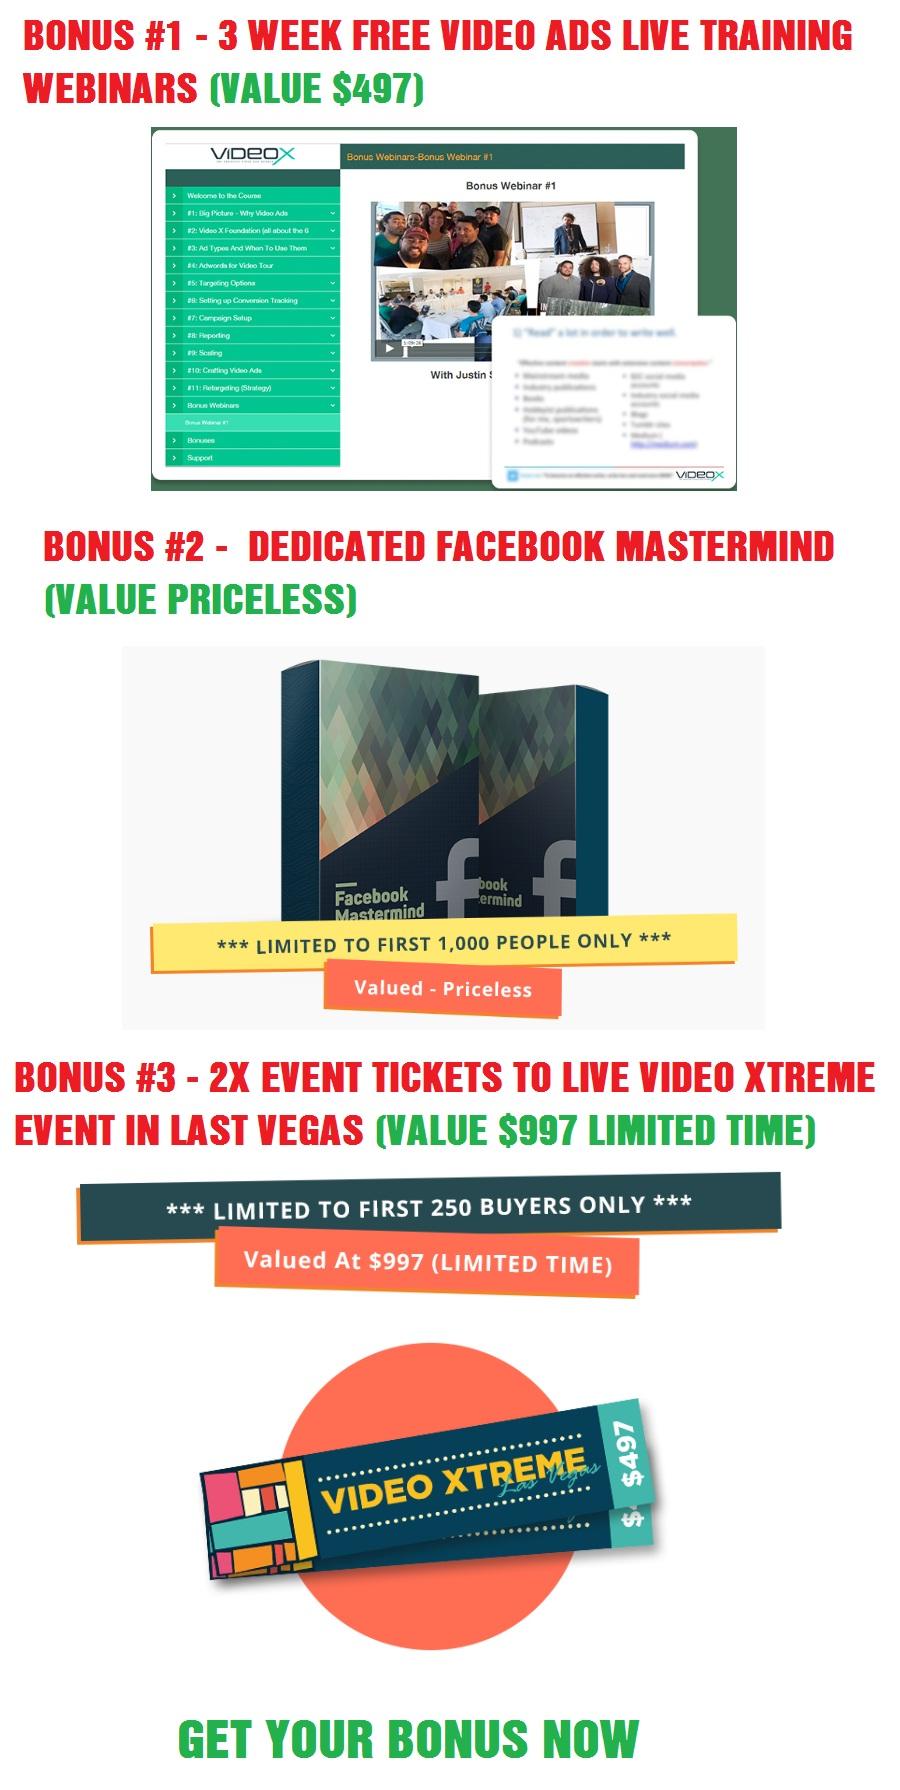 VideoXtreme Bonus